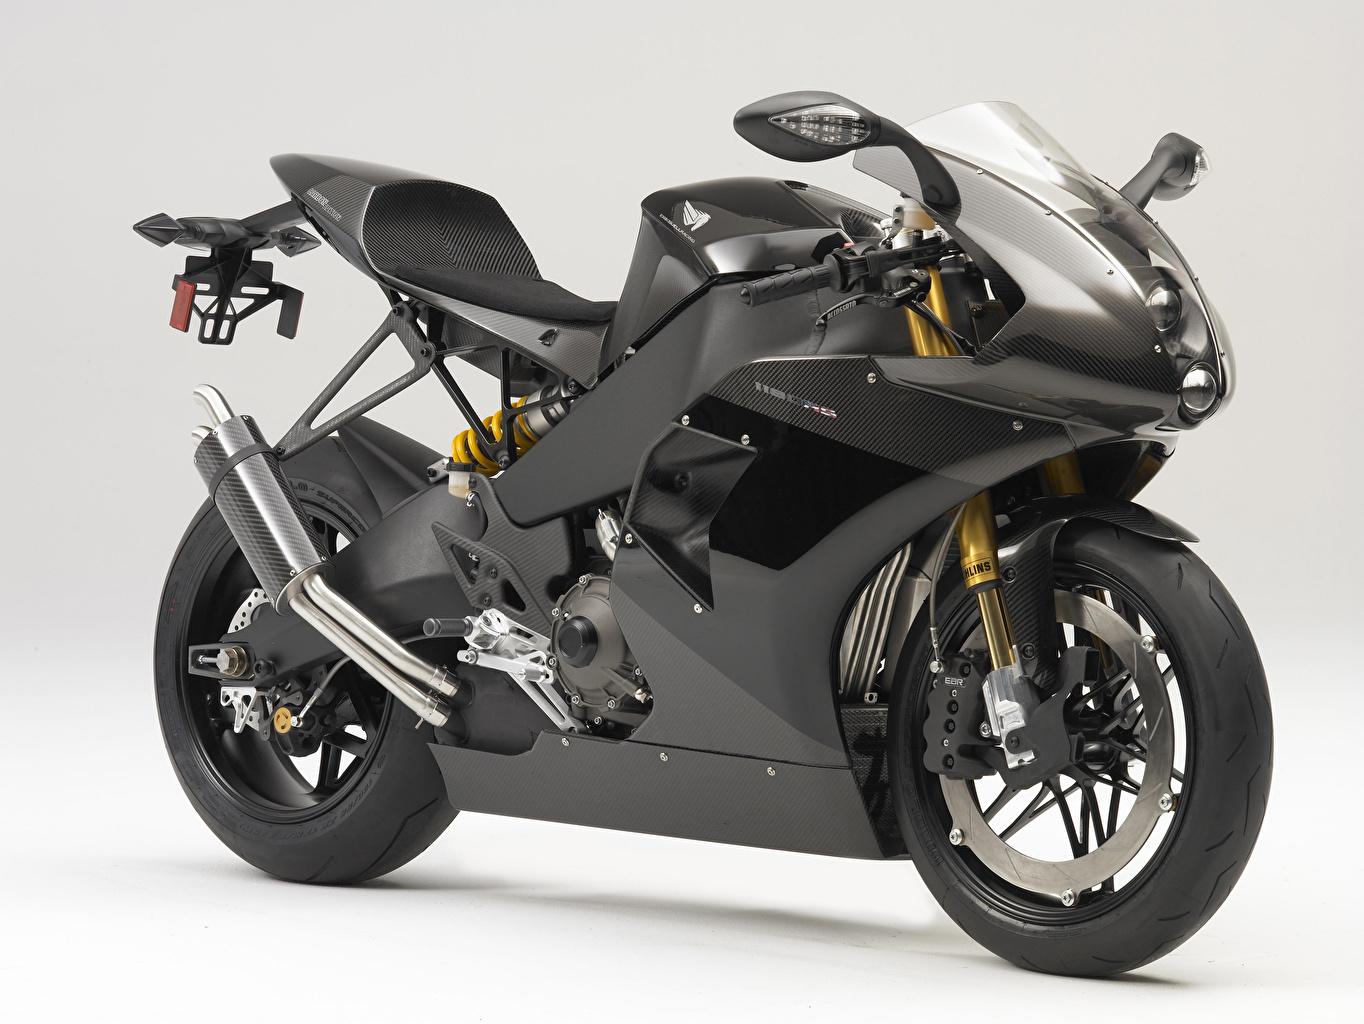 Фотография Карбон 2013-19 EBR 1190RS мотоцикл Сбоку Серый фон карбоновая карбоновый карбоновые Углепластик Мотоциклы сером фоне